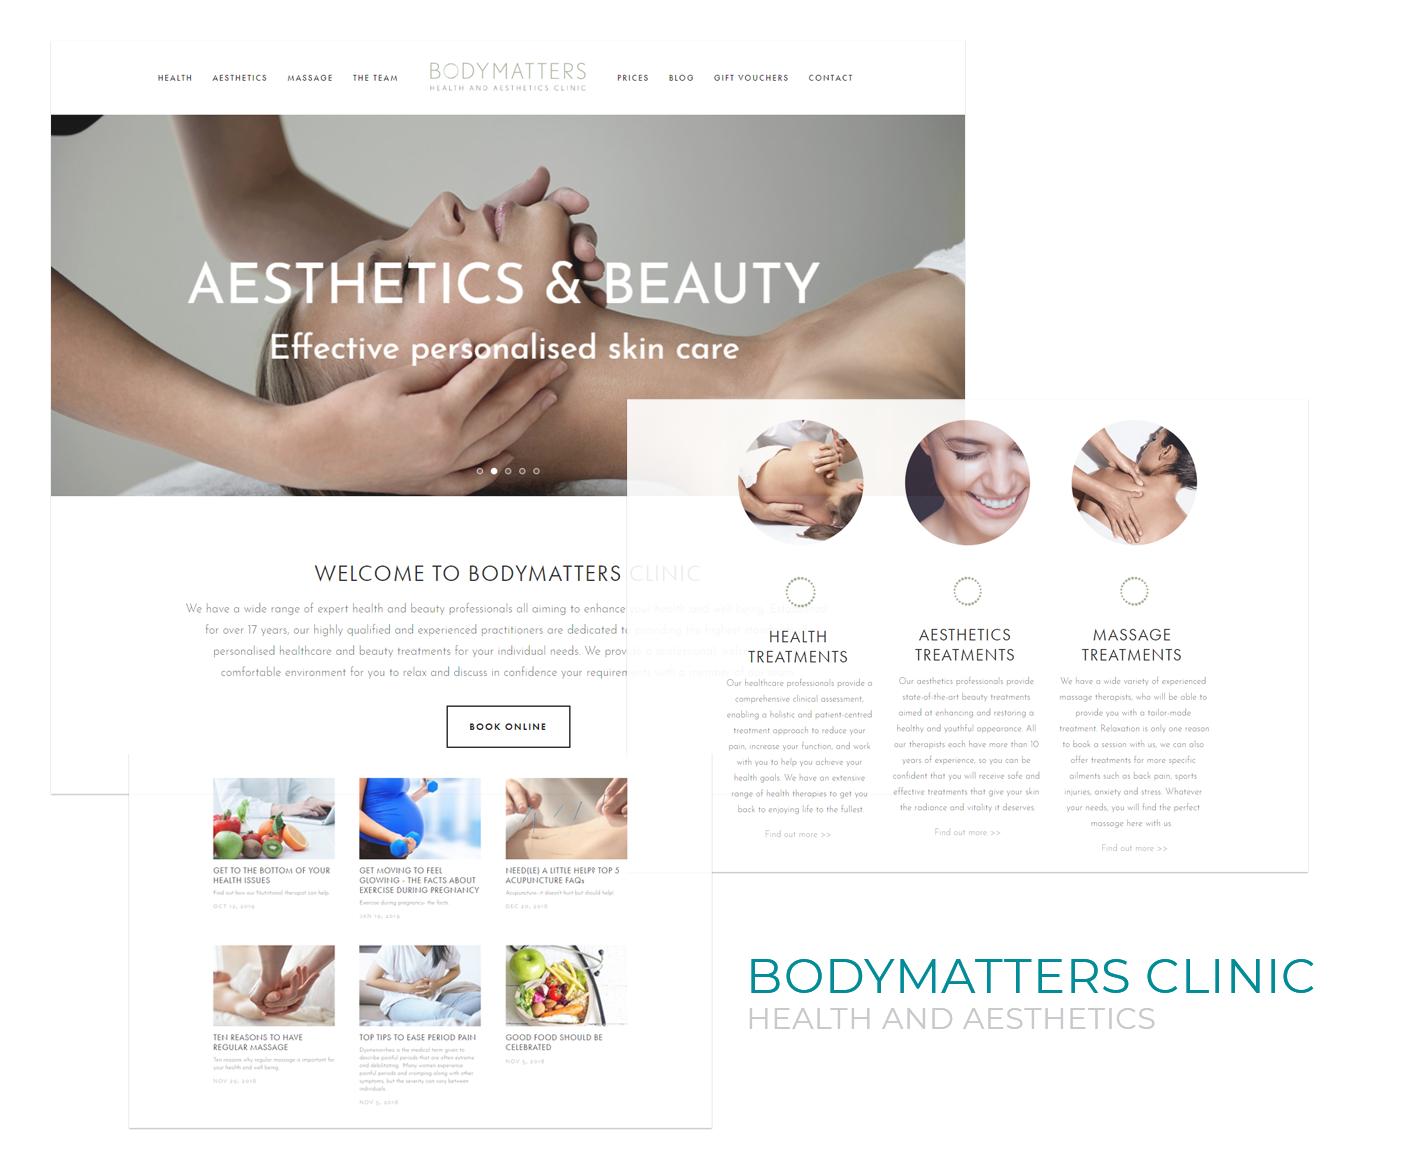 coloy-web-clients-bodymatters-1.png